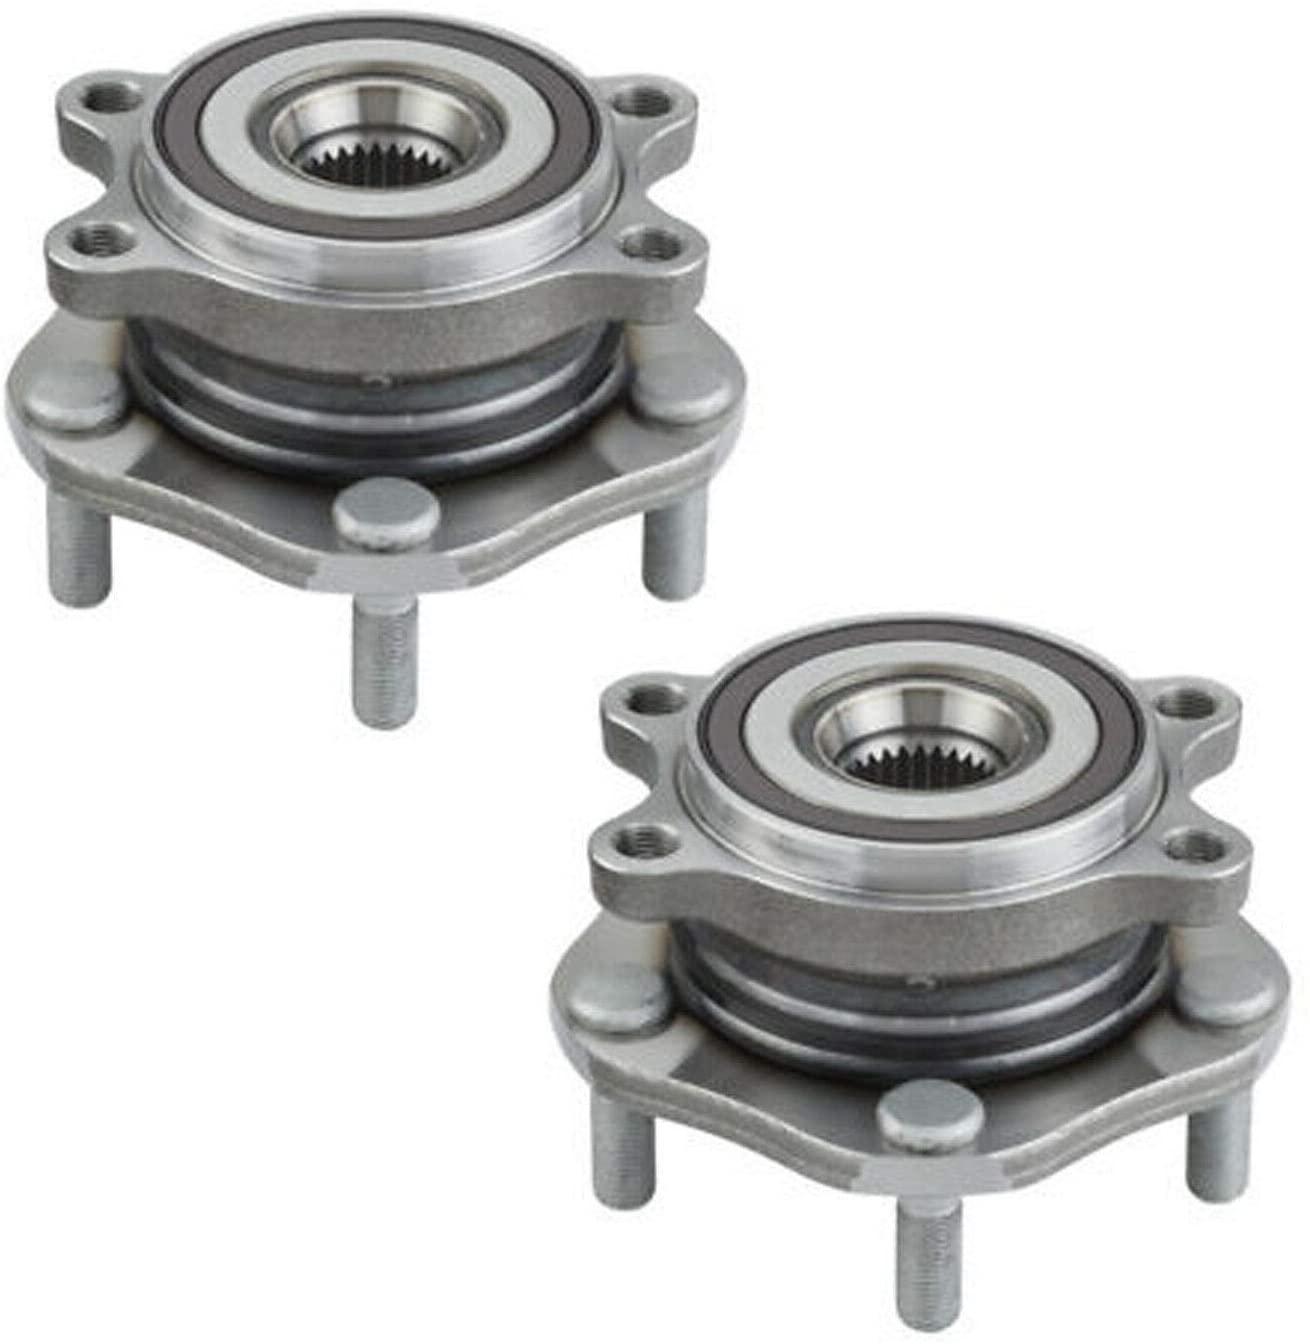 Bodeman - Pair 2 Front Wheel Hub & Bearing Assembly for 2014-2017 Nissan Rogue